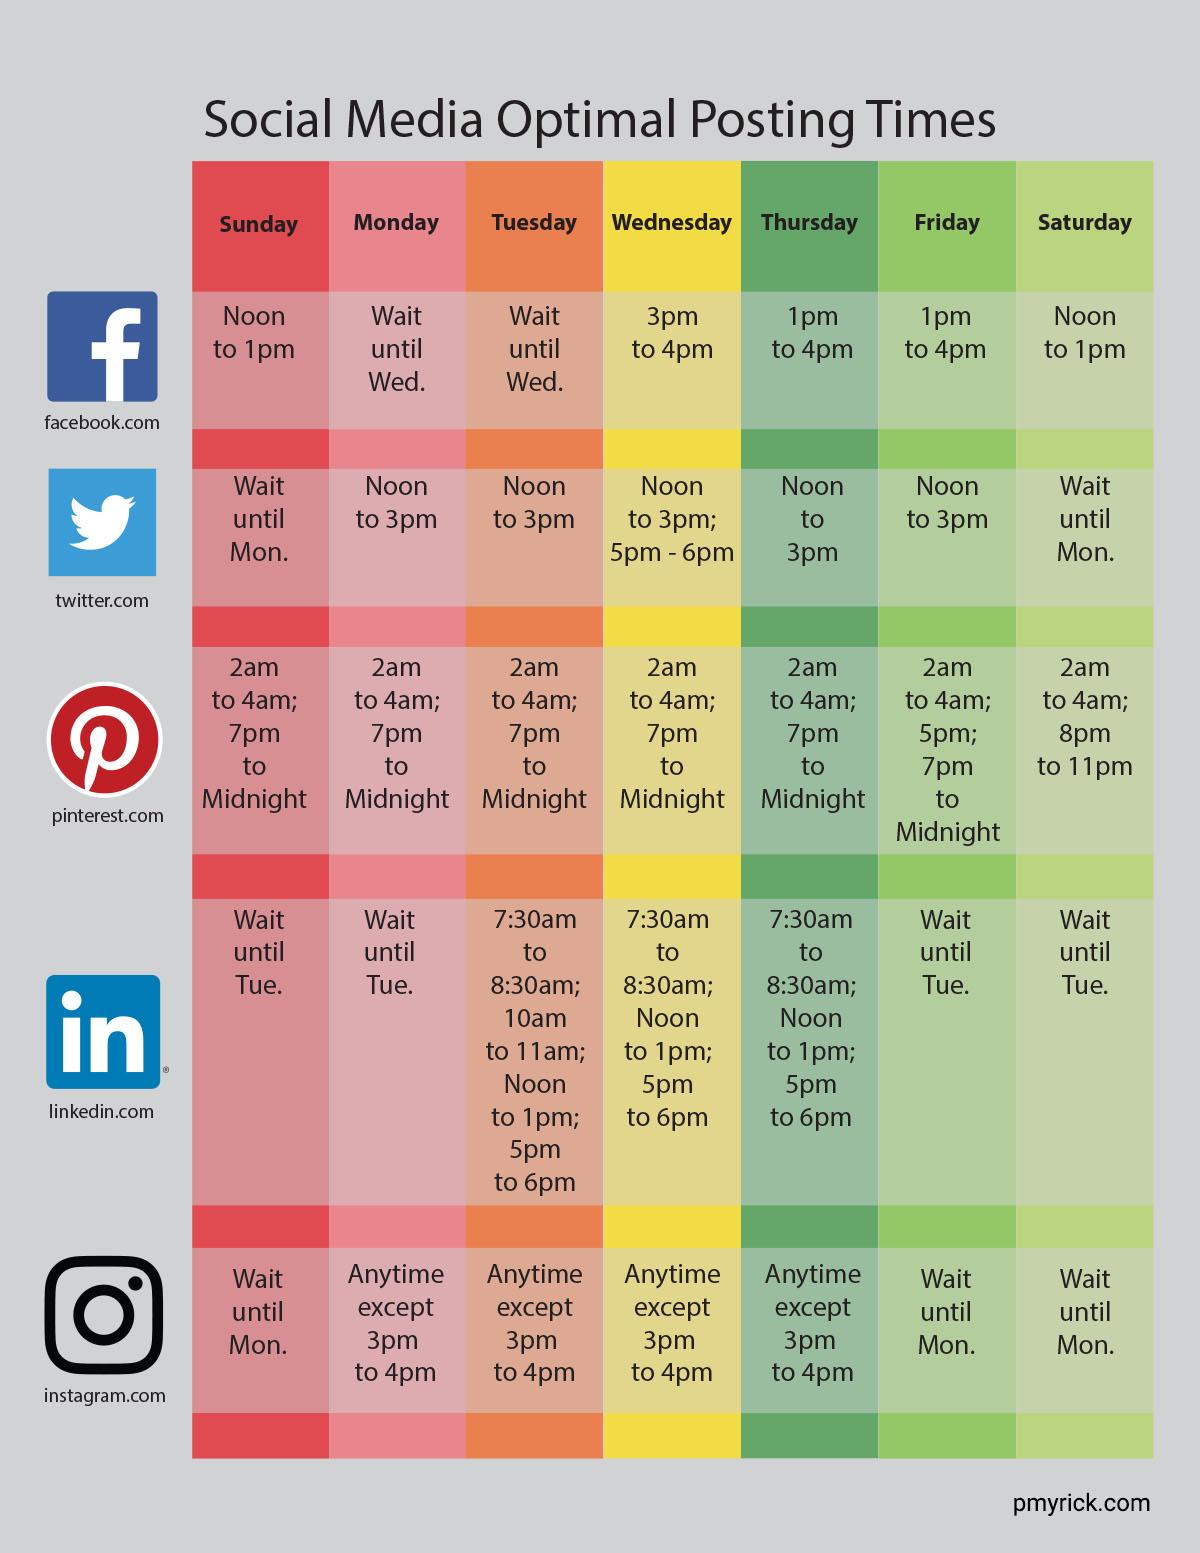 Social Media Optimal Posting Times Simplified Diagram